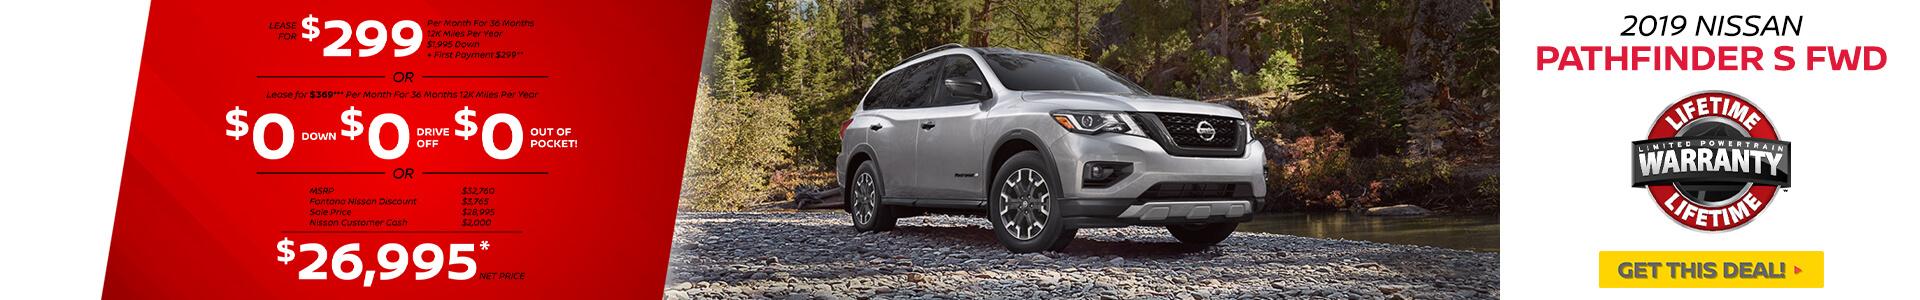 Nissan Pathfinder $299 Lease